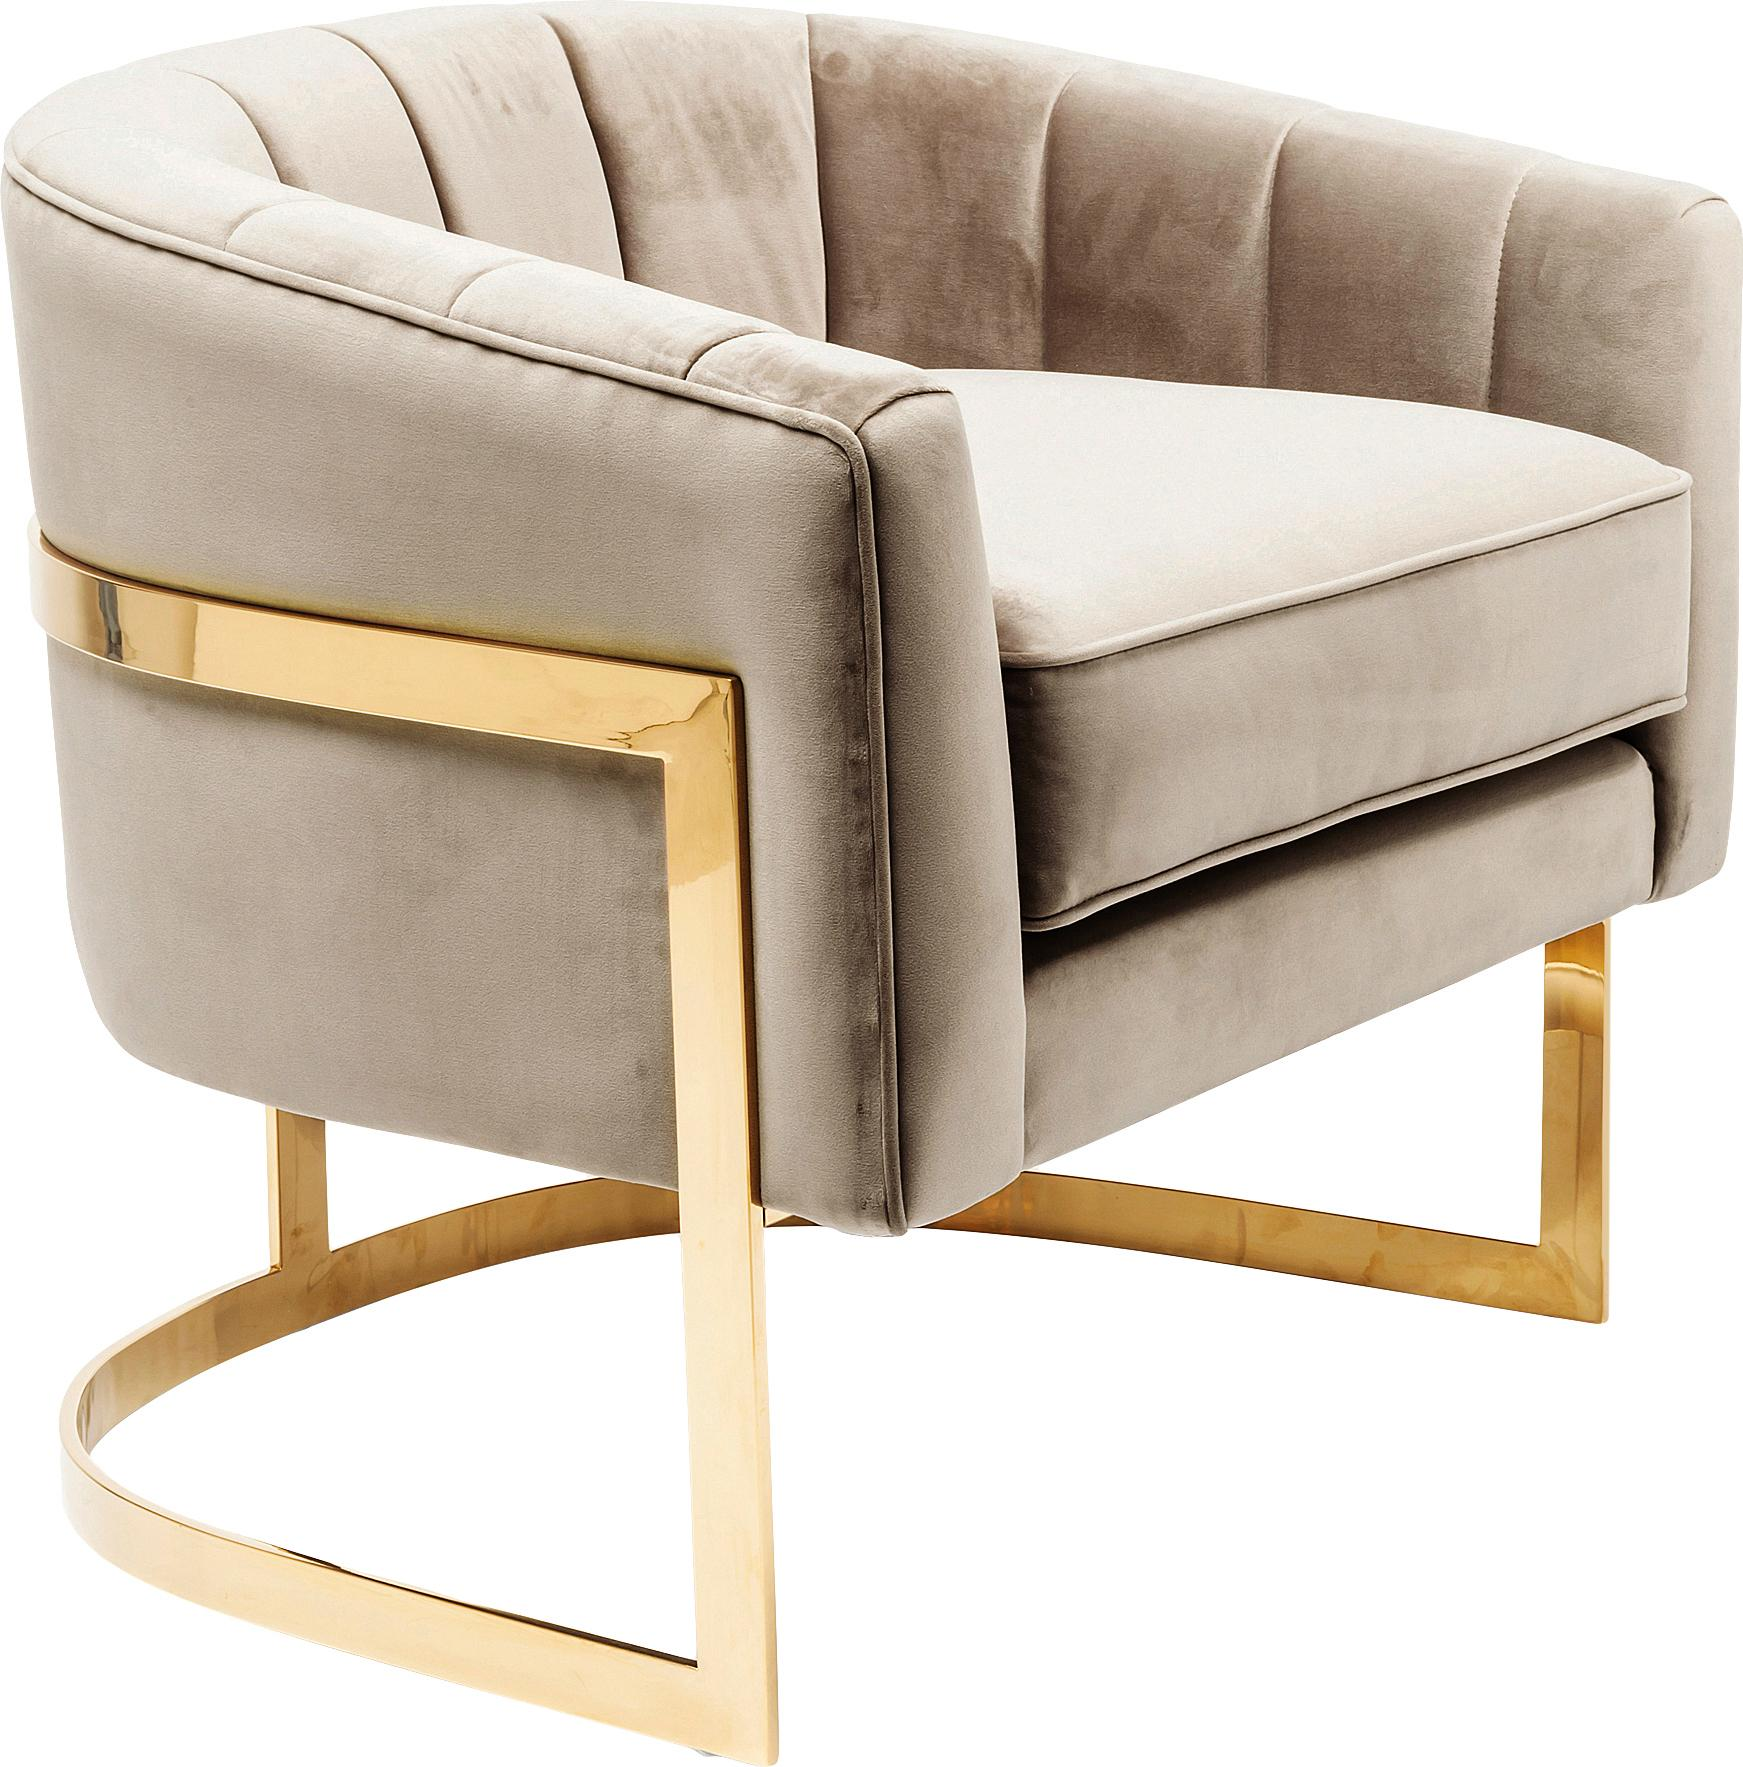 Fluwelen lounge fauteuil Pure Elegance in greige, Bekleding: polyester (fluweel), Frame: verchroomd edelstaal, Frame: massief grenenhout, Fluweel greige, B 77 x D 70 cm